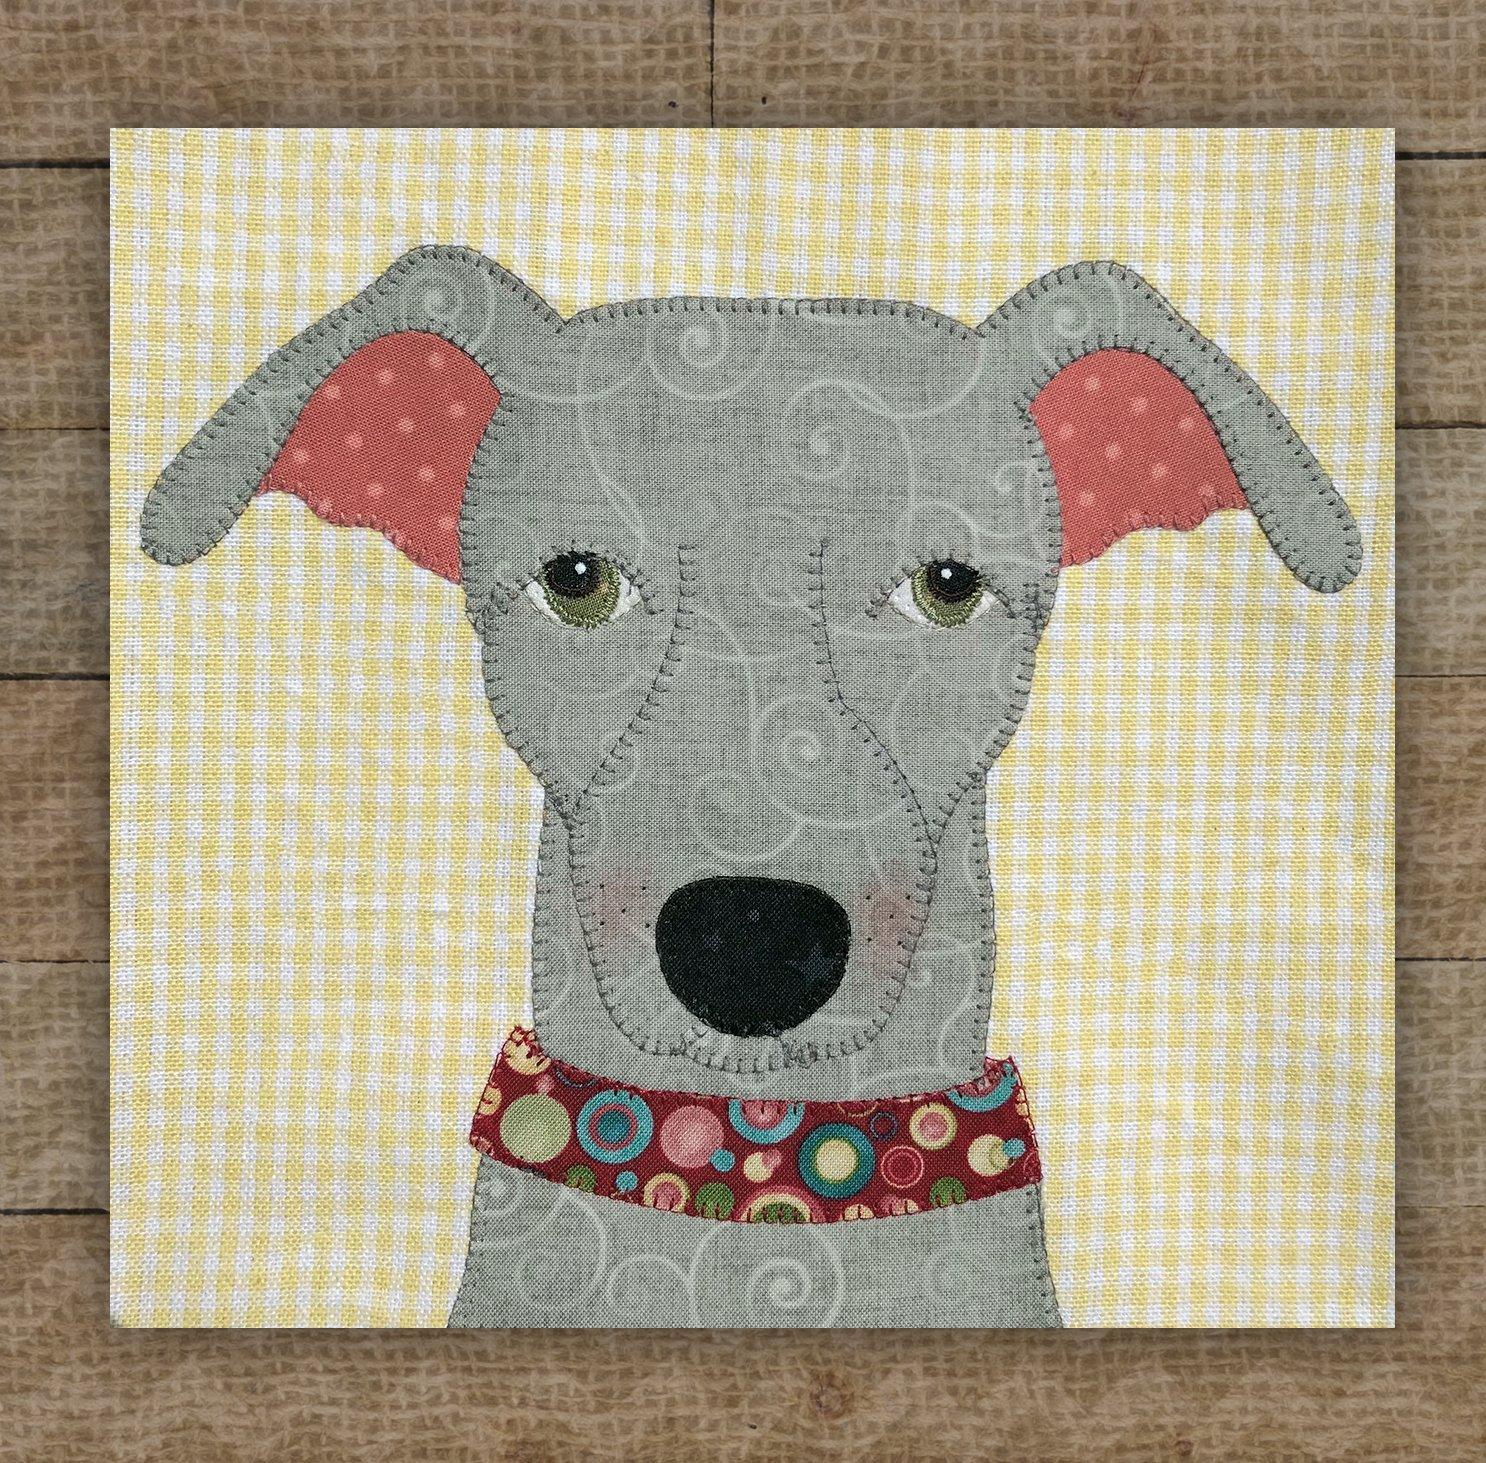 Greyhound - COMING SOON